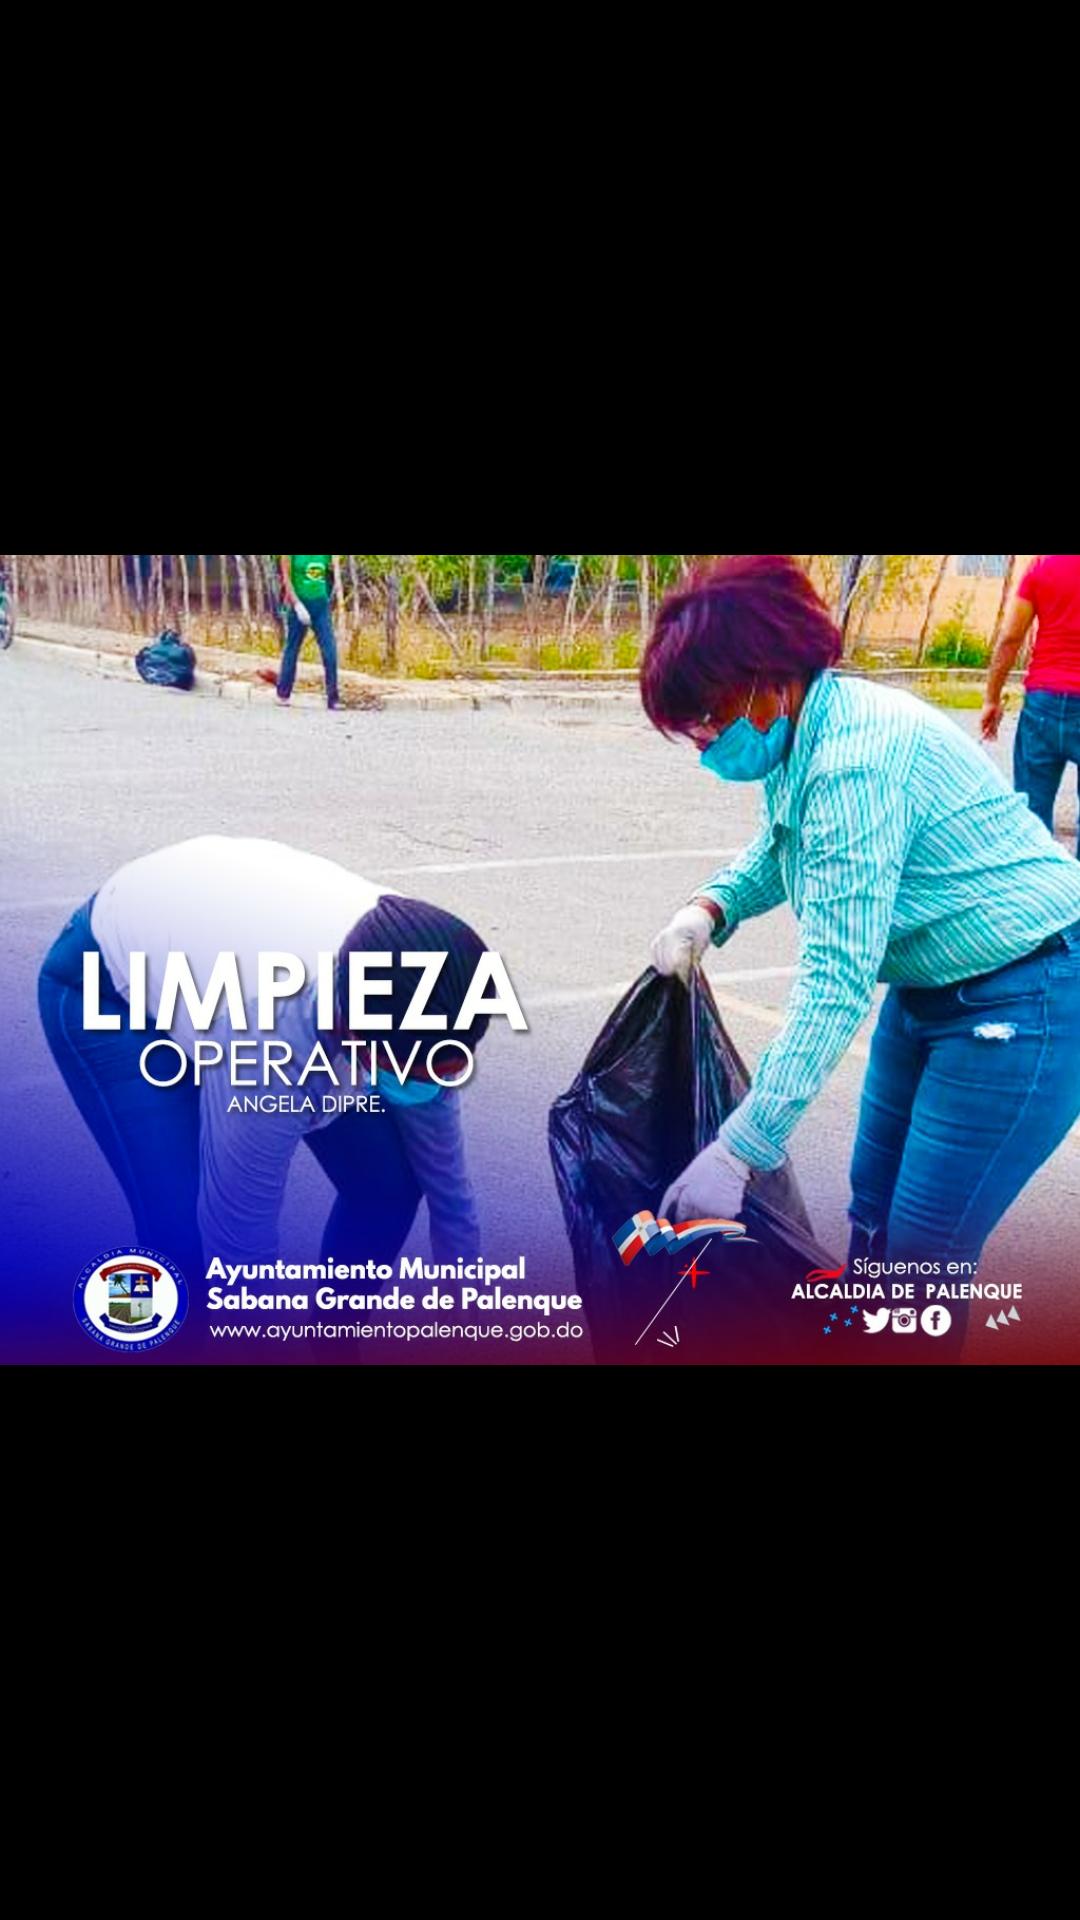 Angela Dipre continúa Jornada de Limpiez